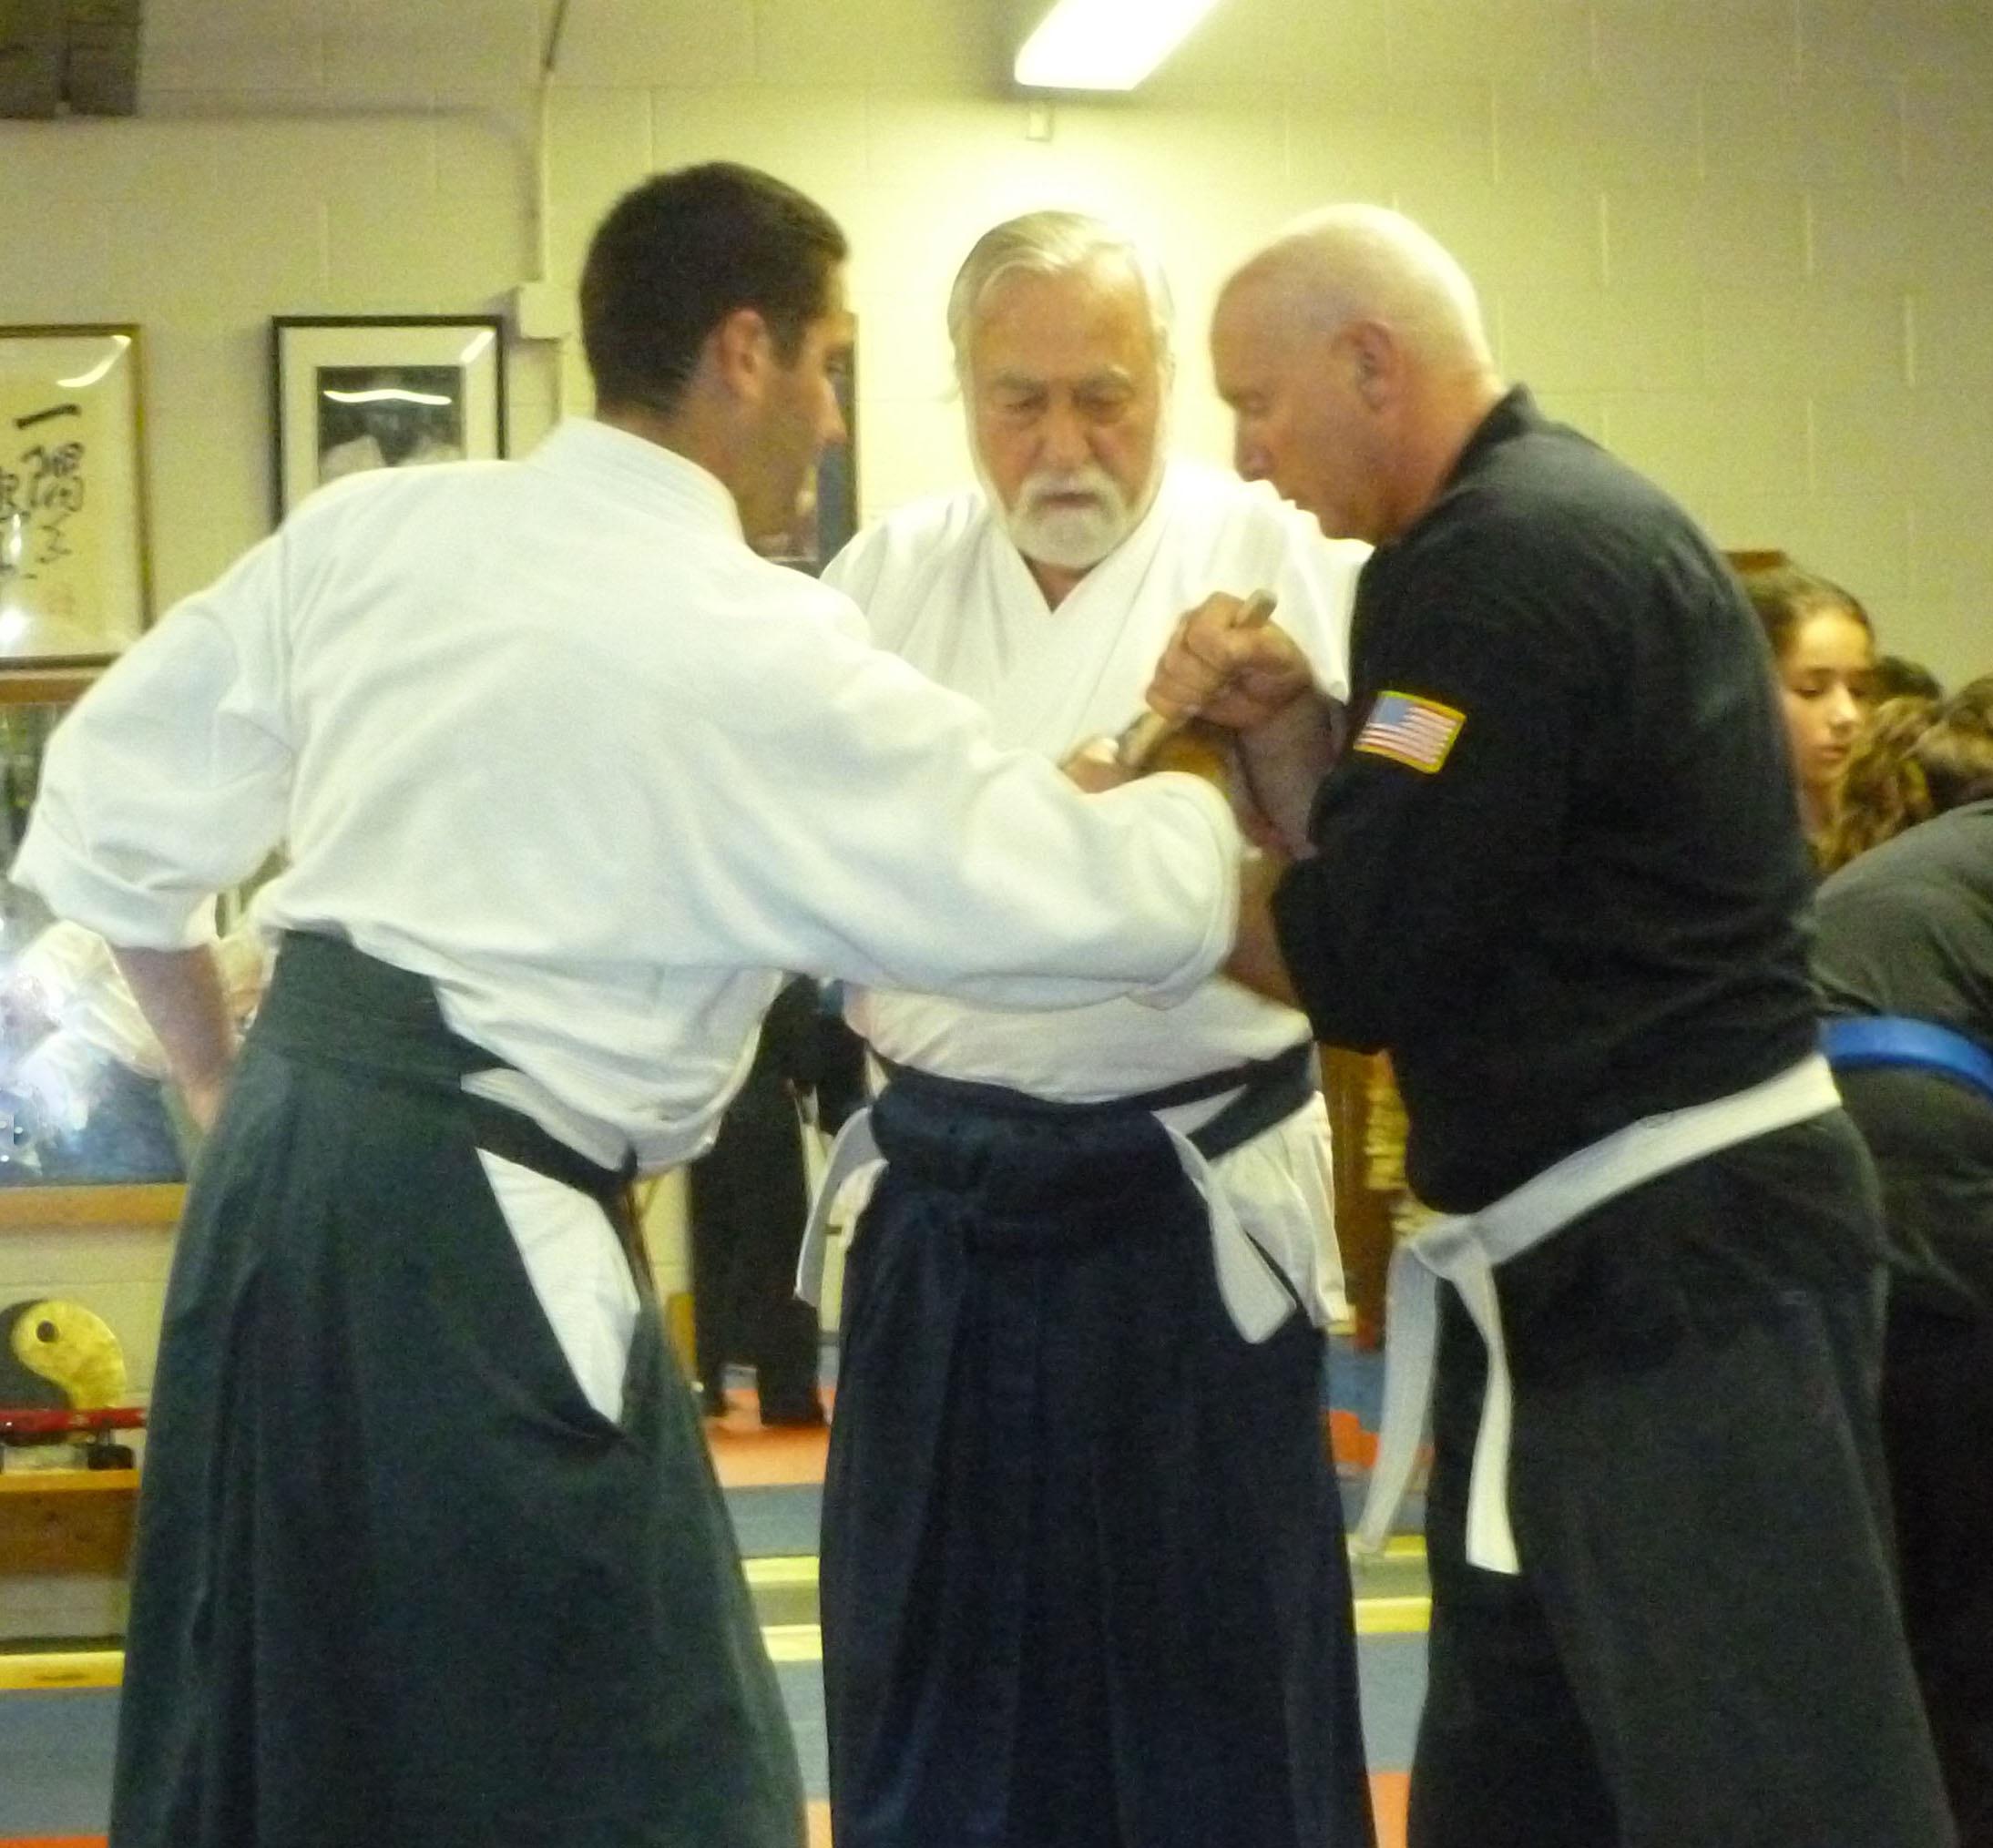 Demonstrating tessen compressions with Ken Jeremiah, at Don Culp's Karate Studio, RI.